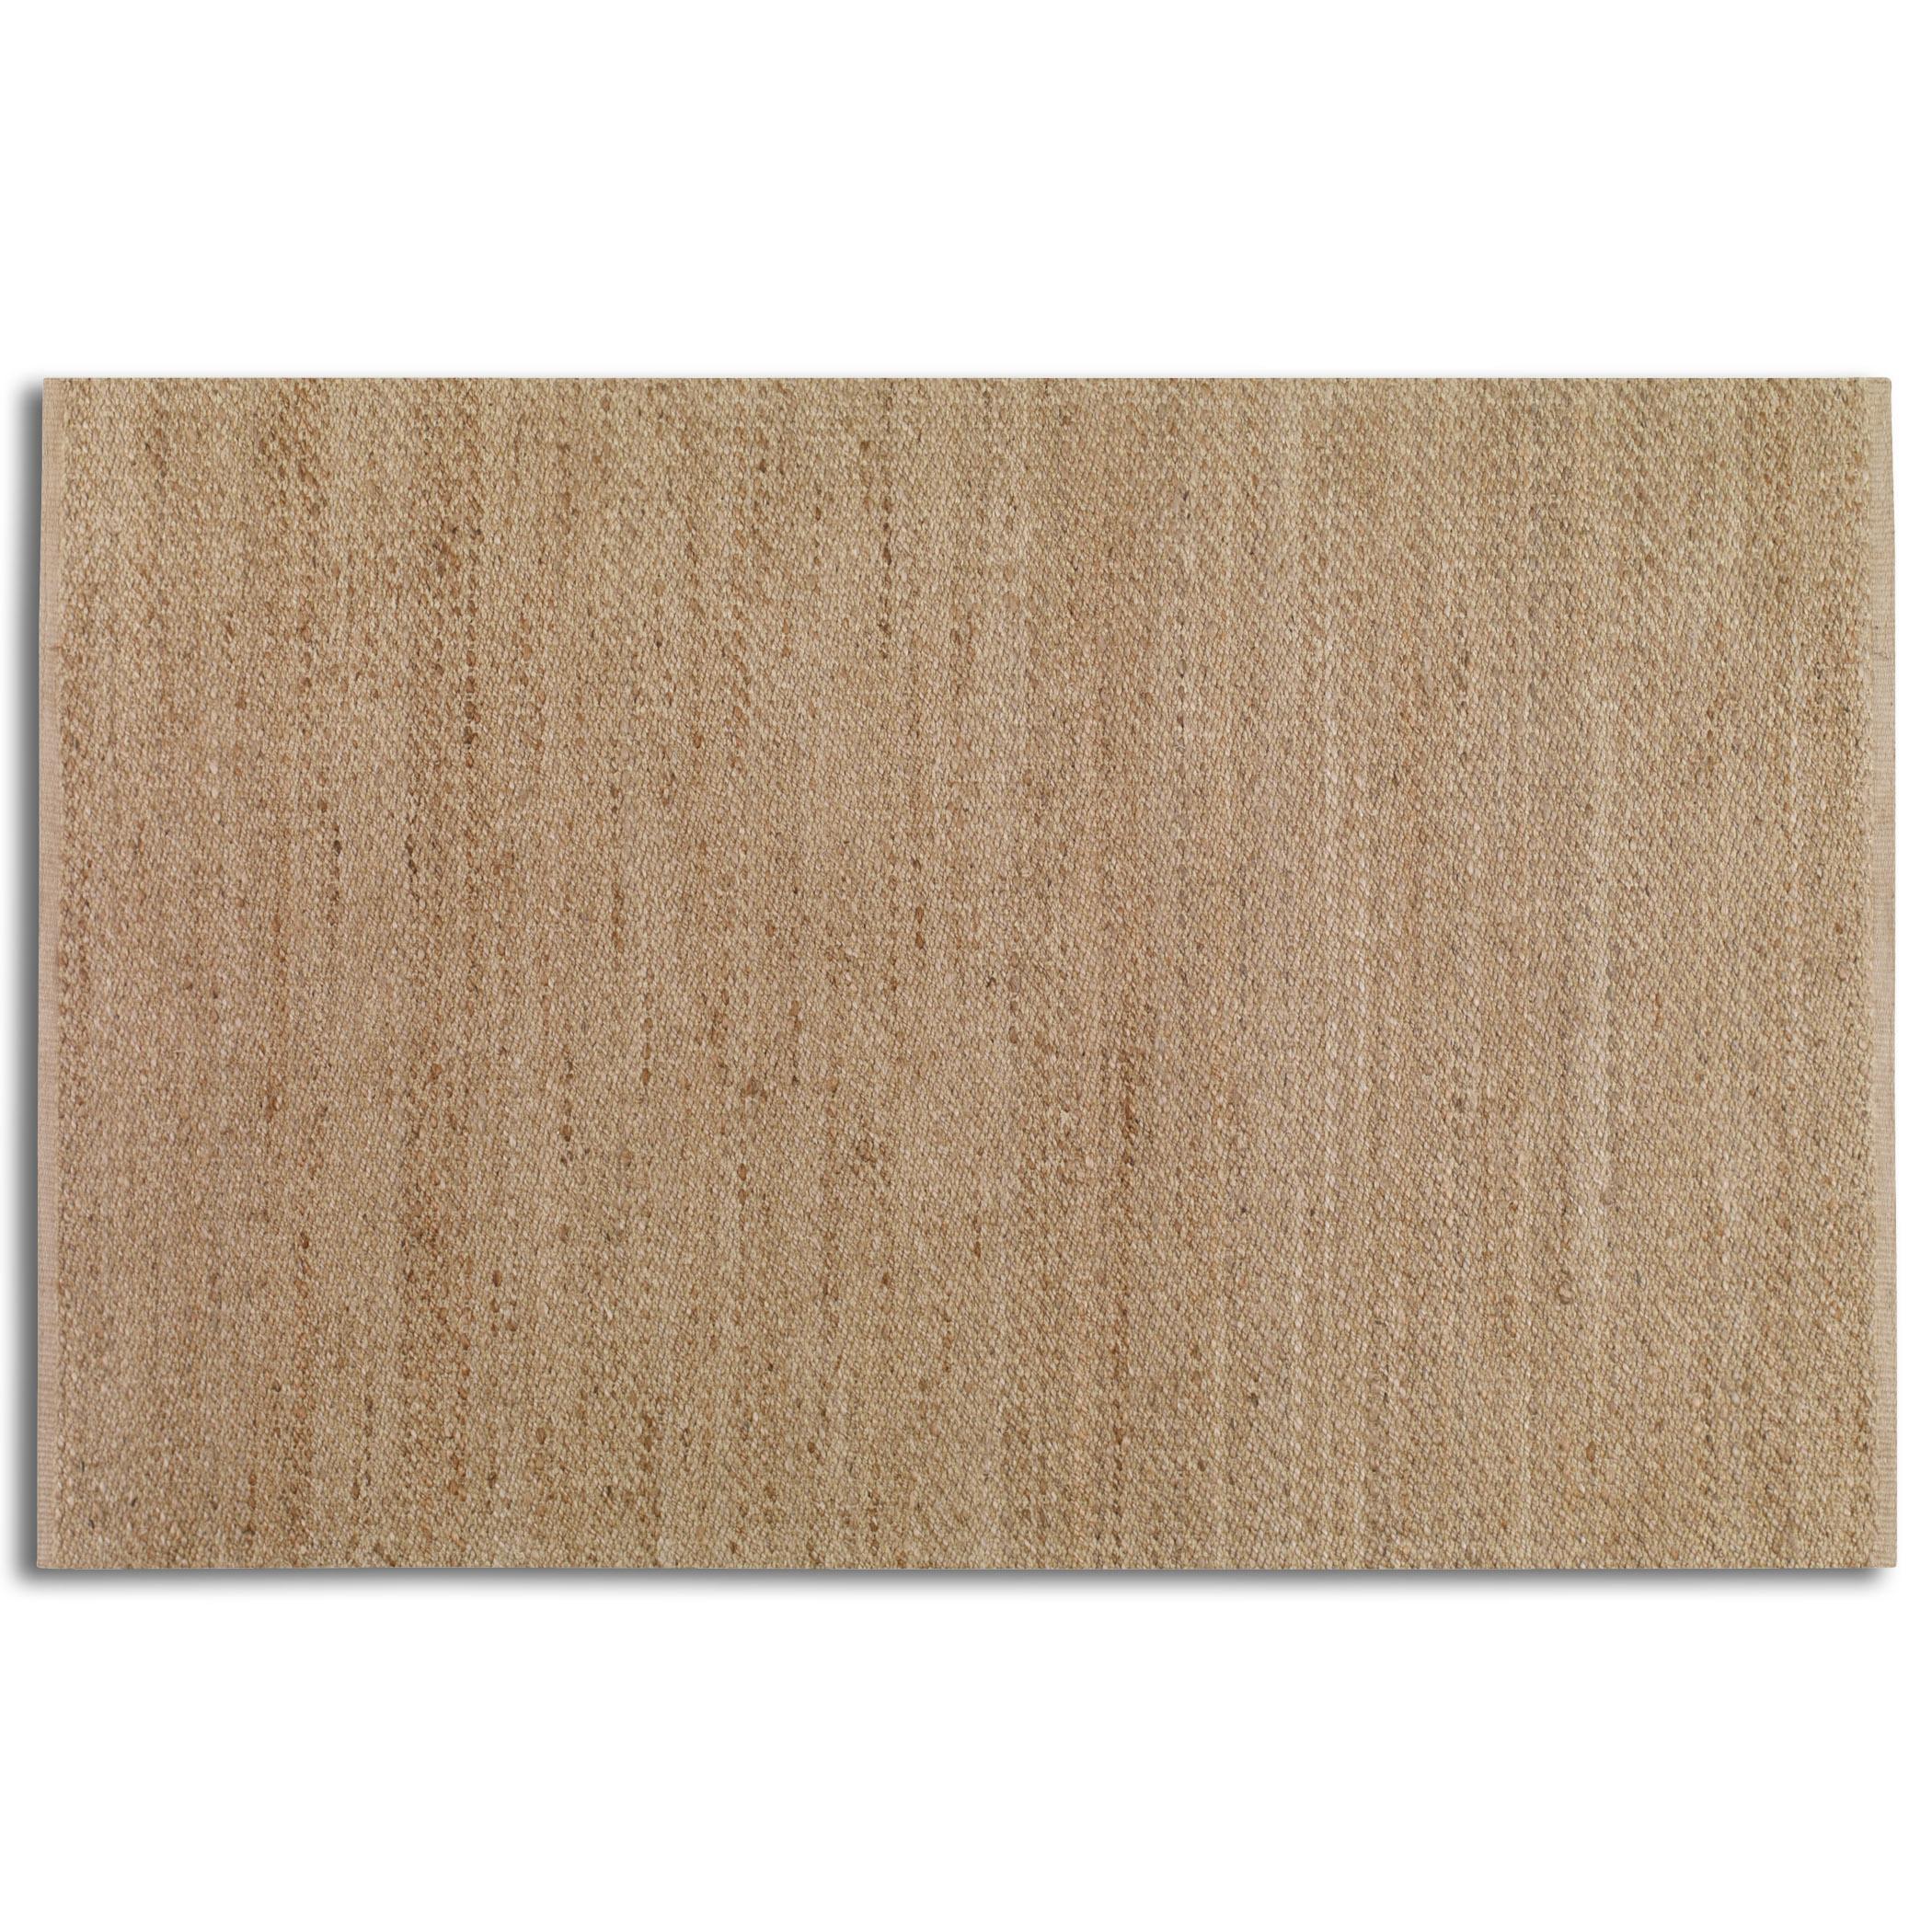 Uttermost Rugs Karima 5 X 8 Rug - Beige - Item Number: 71051-5